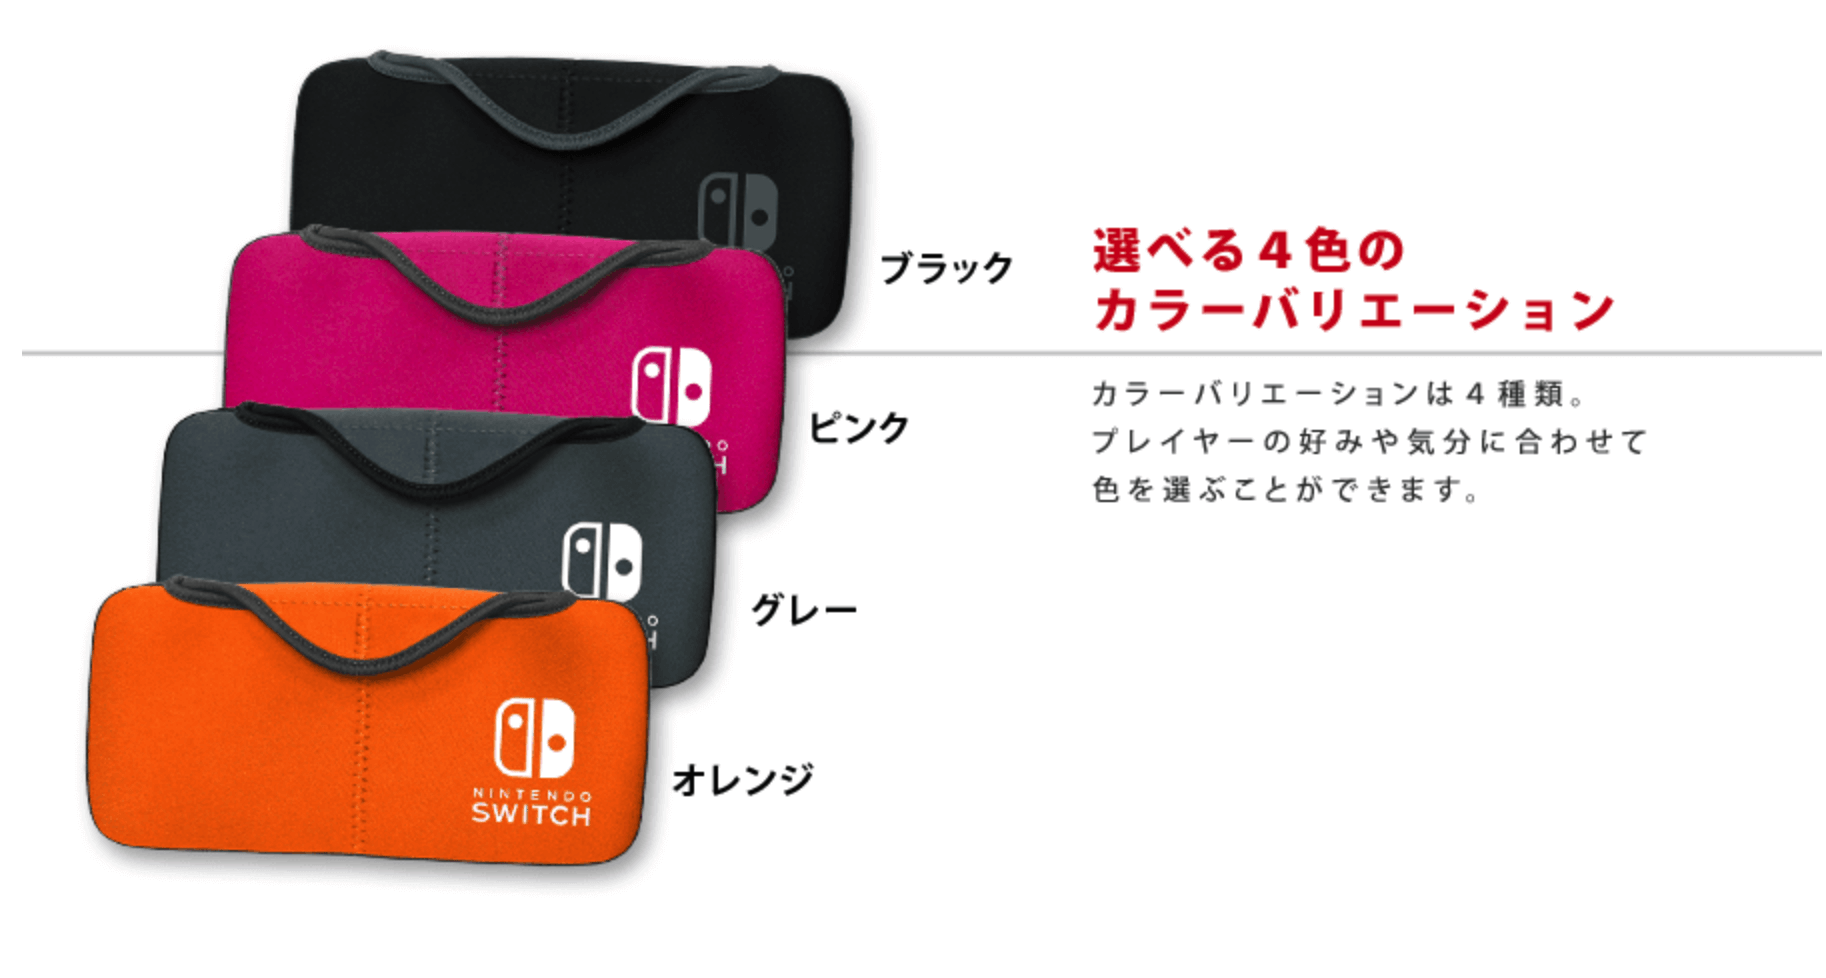 Nintendo switch専用ケースポーチ|QUICK POUCHカラバリ